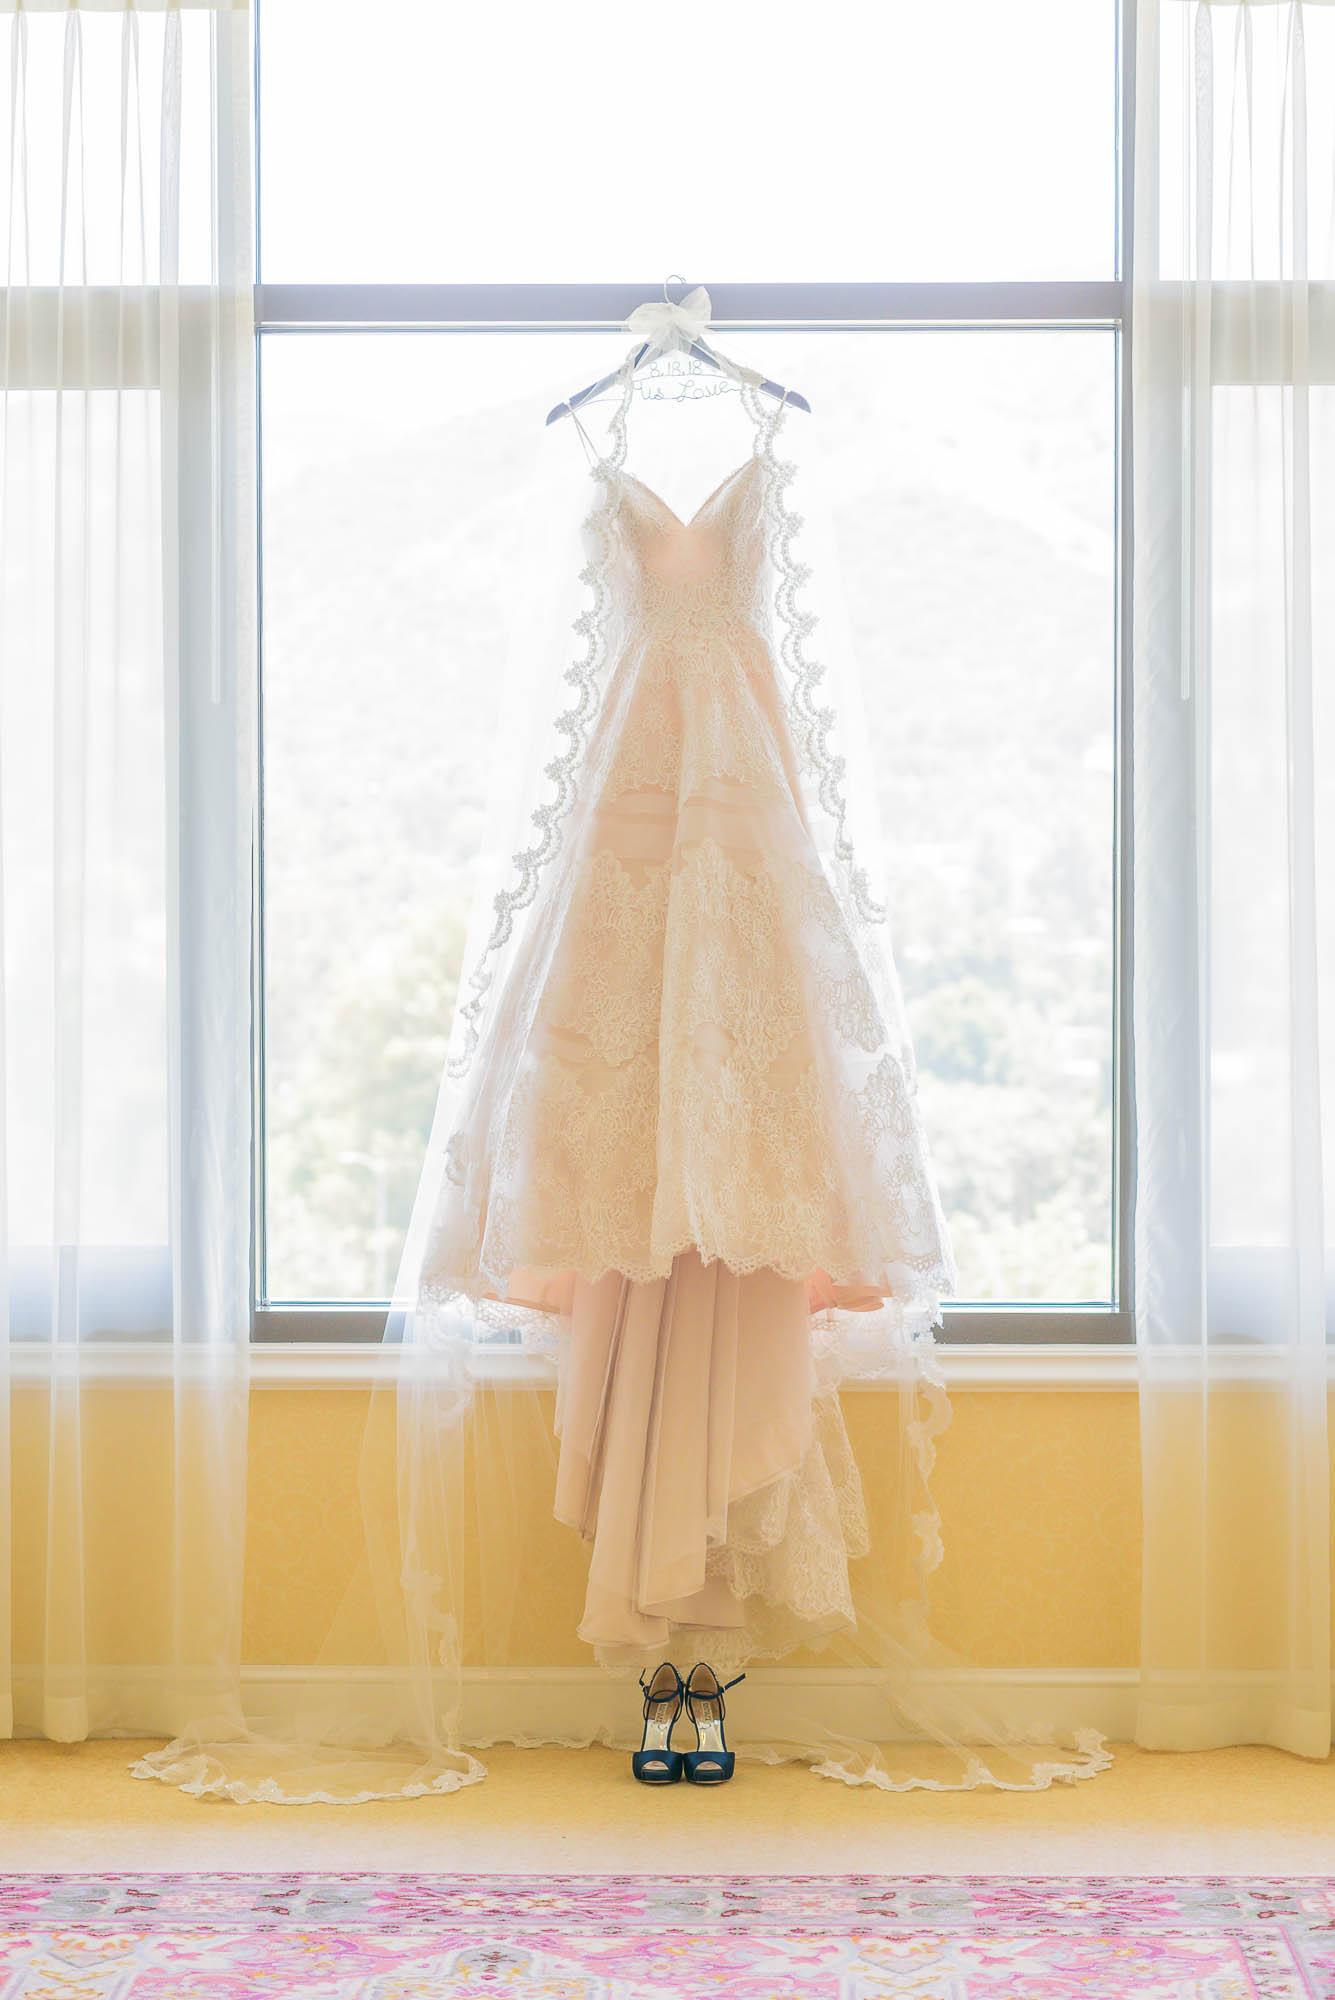 003_Alan_and_Heidi_Wedding_Karla_Paolo